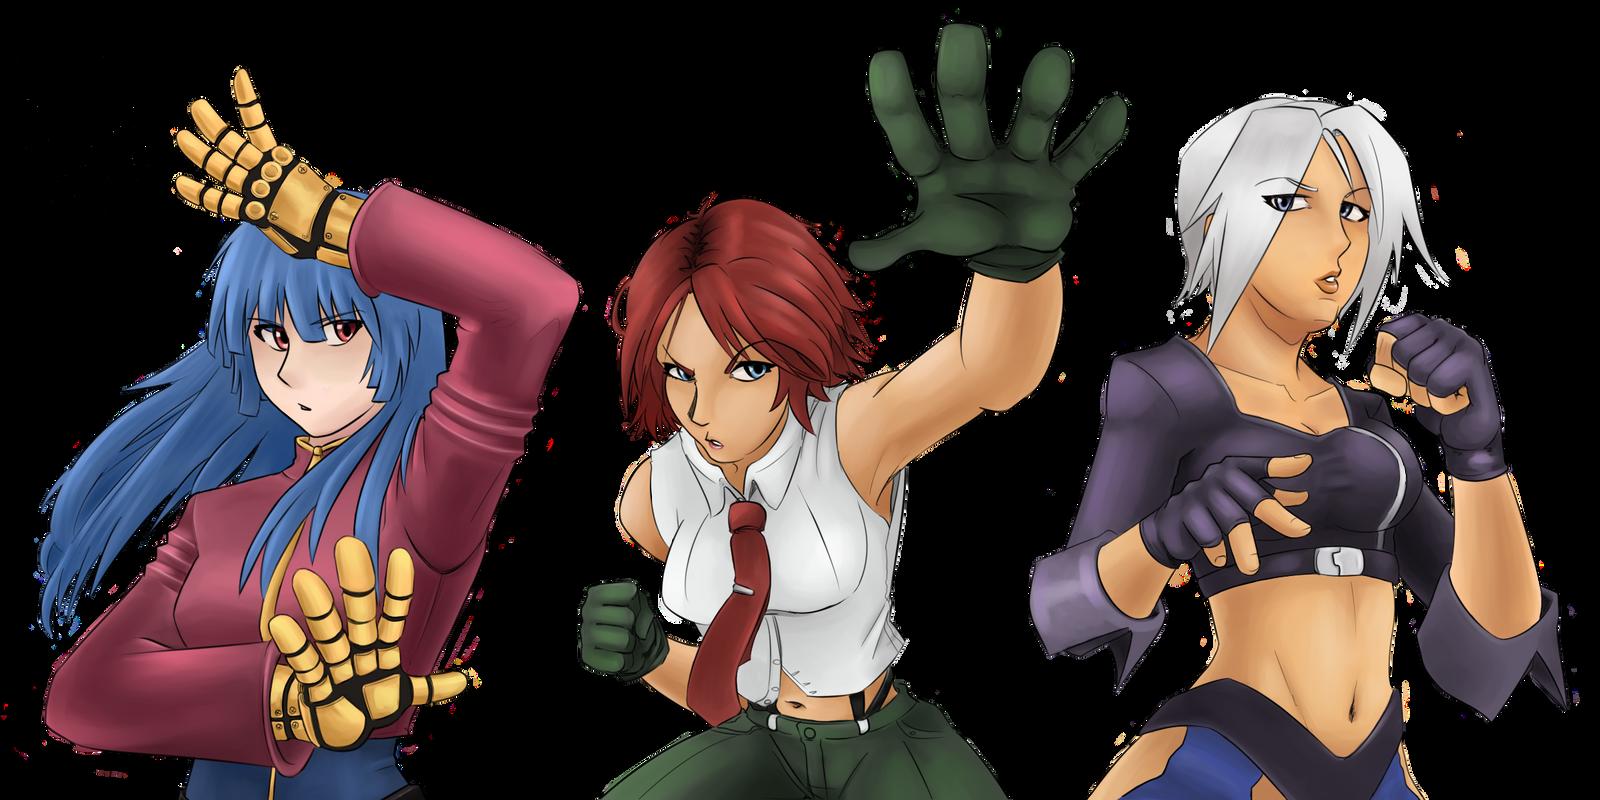 Kof Clark Dibujo Deviantart: The King Of Fighters Best Team By SatyHarvenheit On DeviantArt